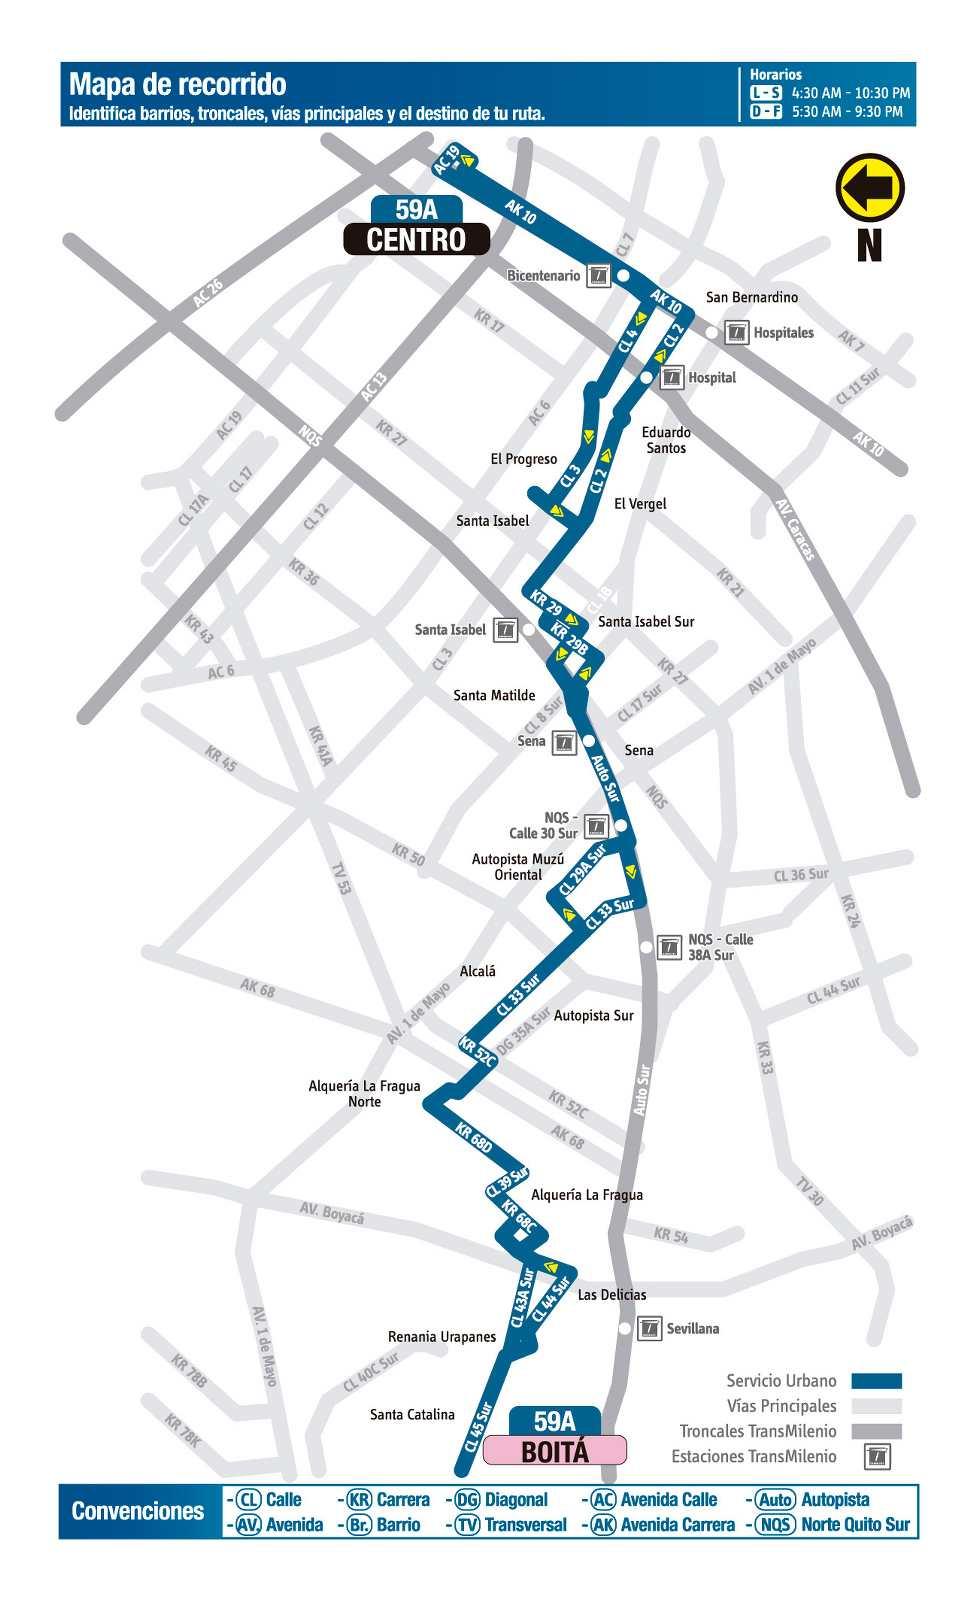 Ruta SITP: 59A Boitá ↔ Centro (mapa)